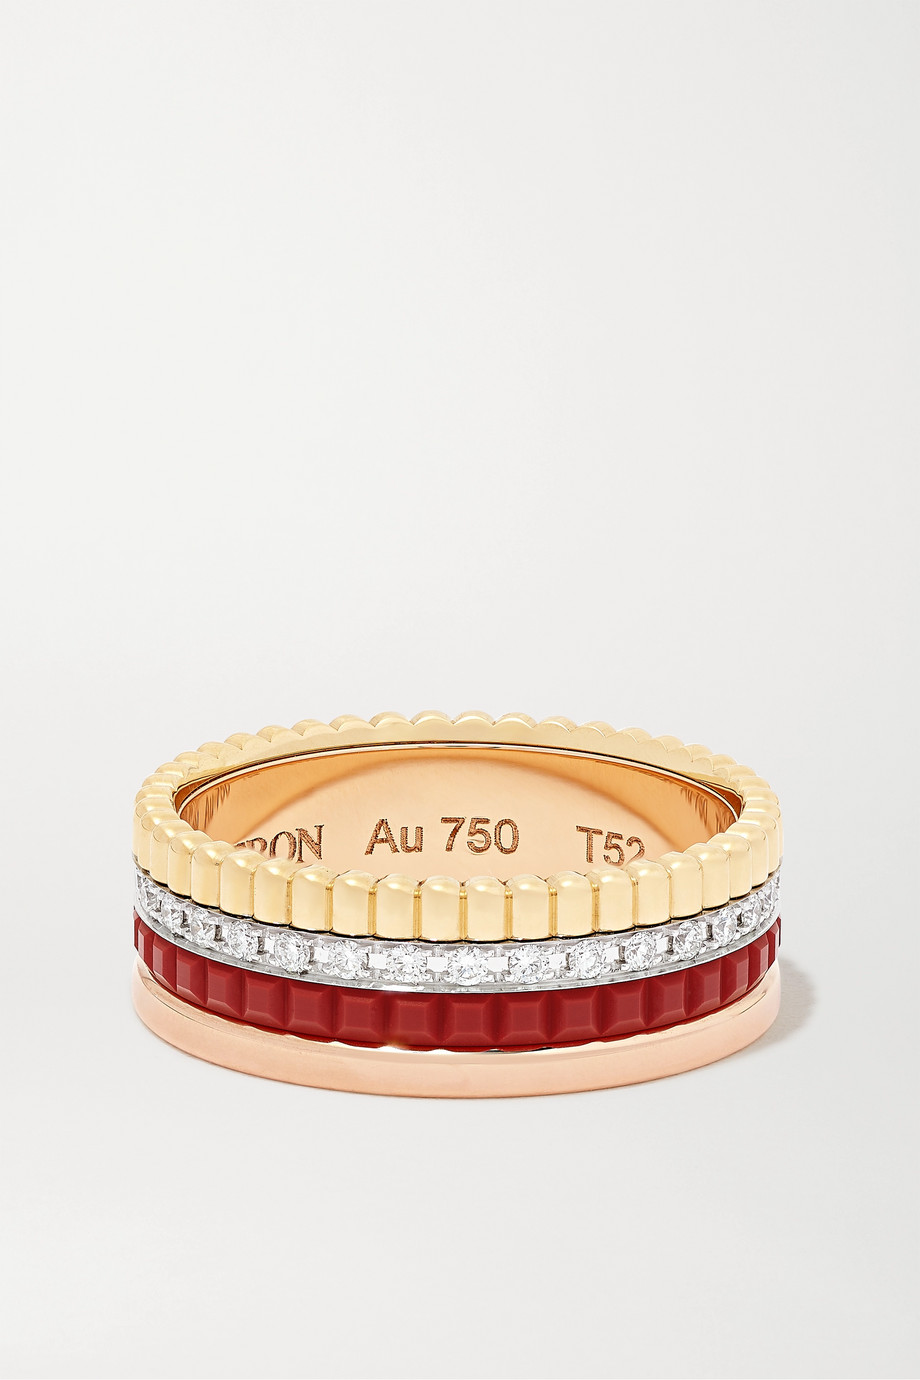 Boucheron Quatre Red Edition 18K 黄金、18K 白金、18K 玫瑰金、陶瓷、钻石小号戒指